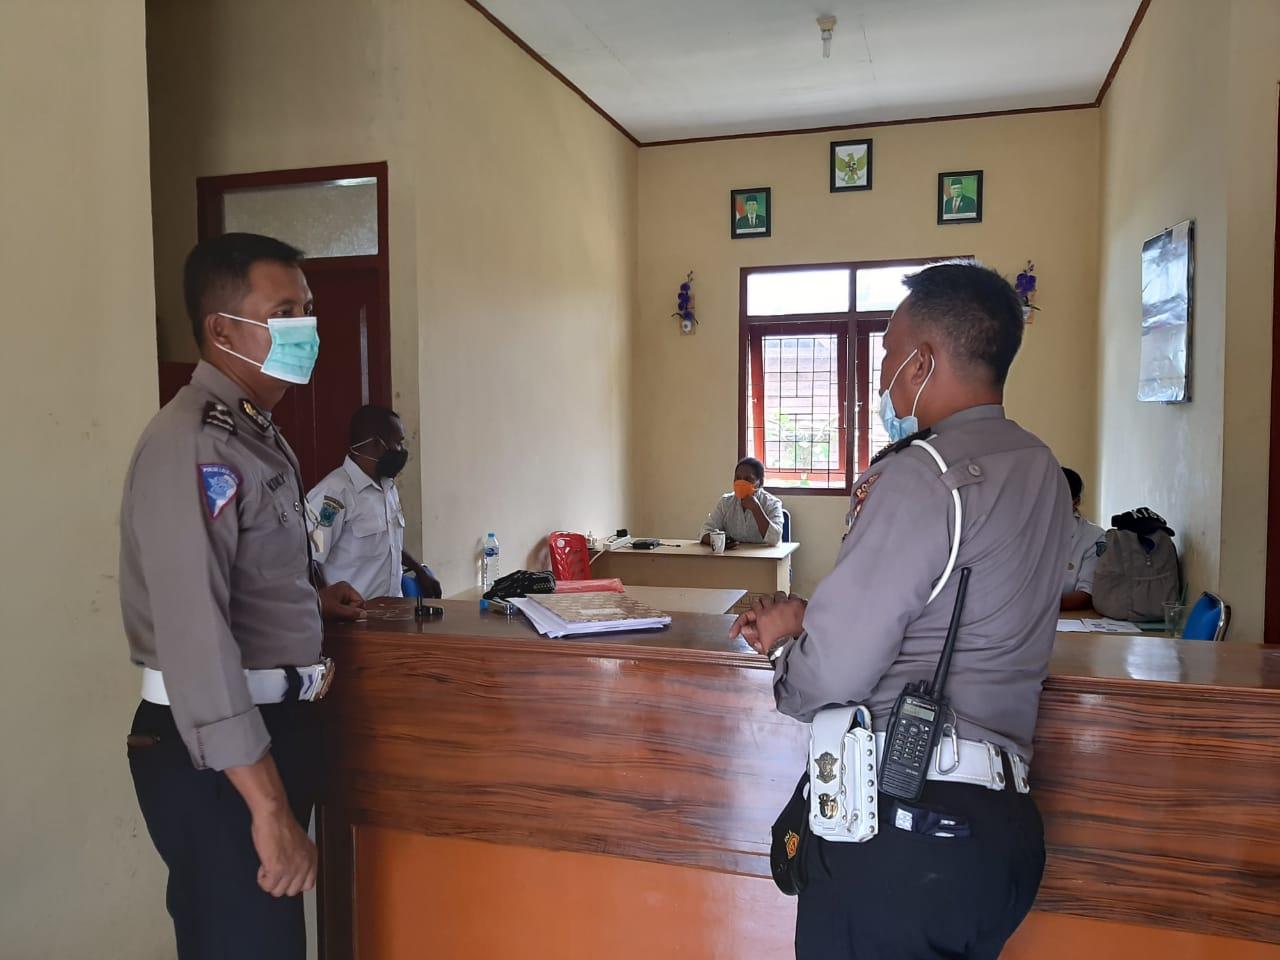 Unit Dikyasa Satlantas Polres Sorong Berencana Bentuk Kampung Tertib Lalu Lintas / Kampung Polantas